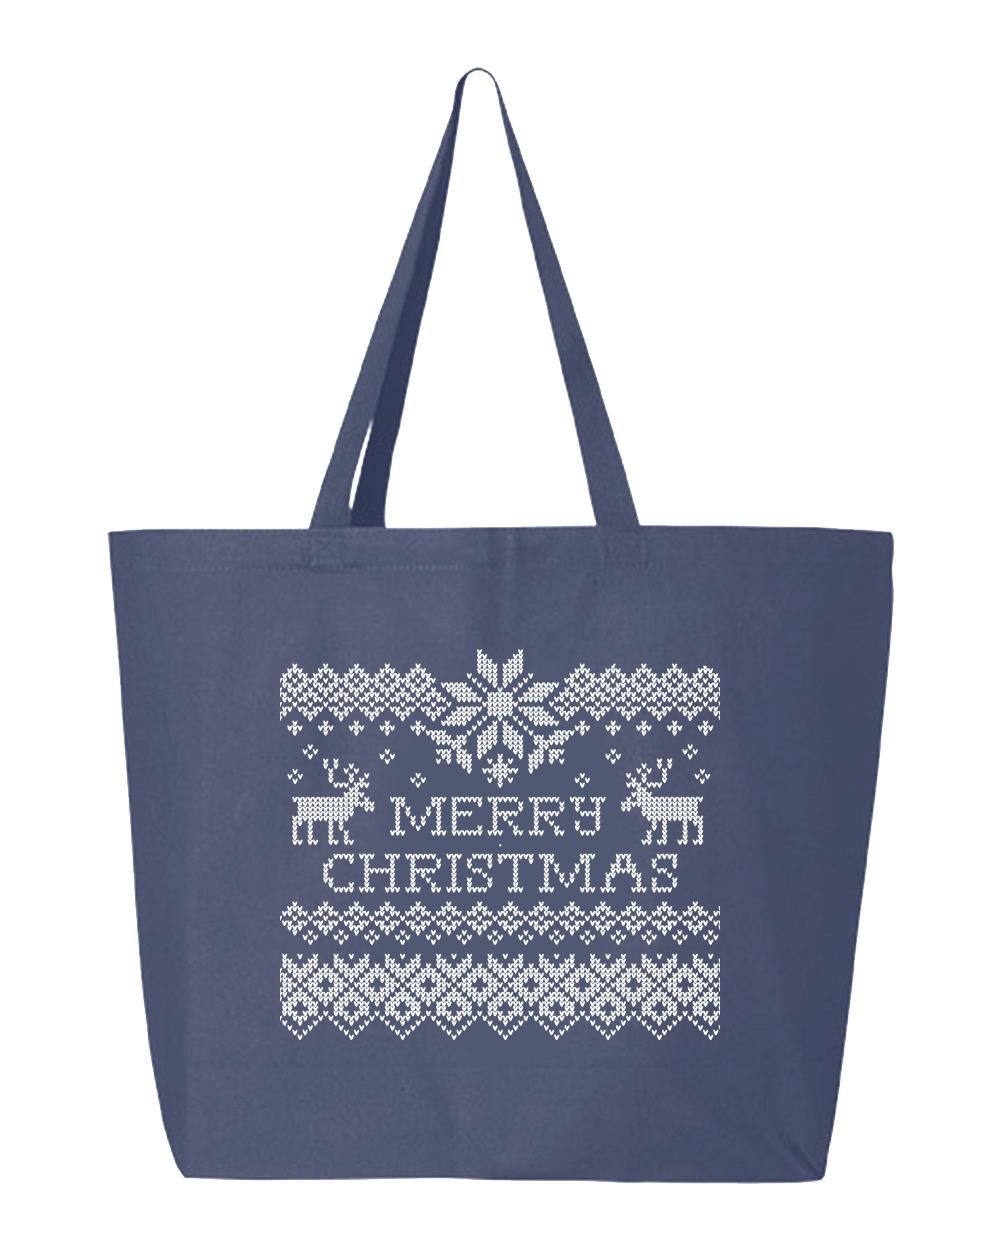 shop4ever Merry ChristmasトナカイHeavyキャンバストートバッグクロスステッチ再利用可能なショッピングバッグ10オンスジャンボ 25 oz ブルー S4E_1215_ChristRinds_TB_Q600_Navy_2 B072HGHJXF ネイビー|2 ネイビー